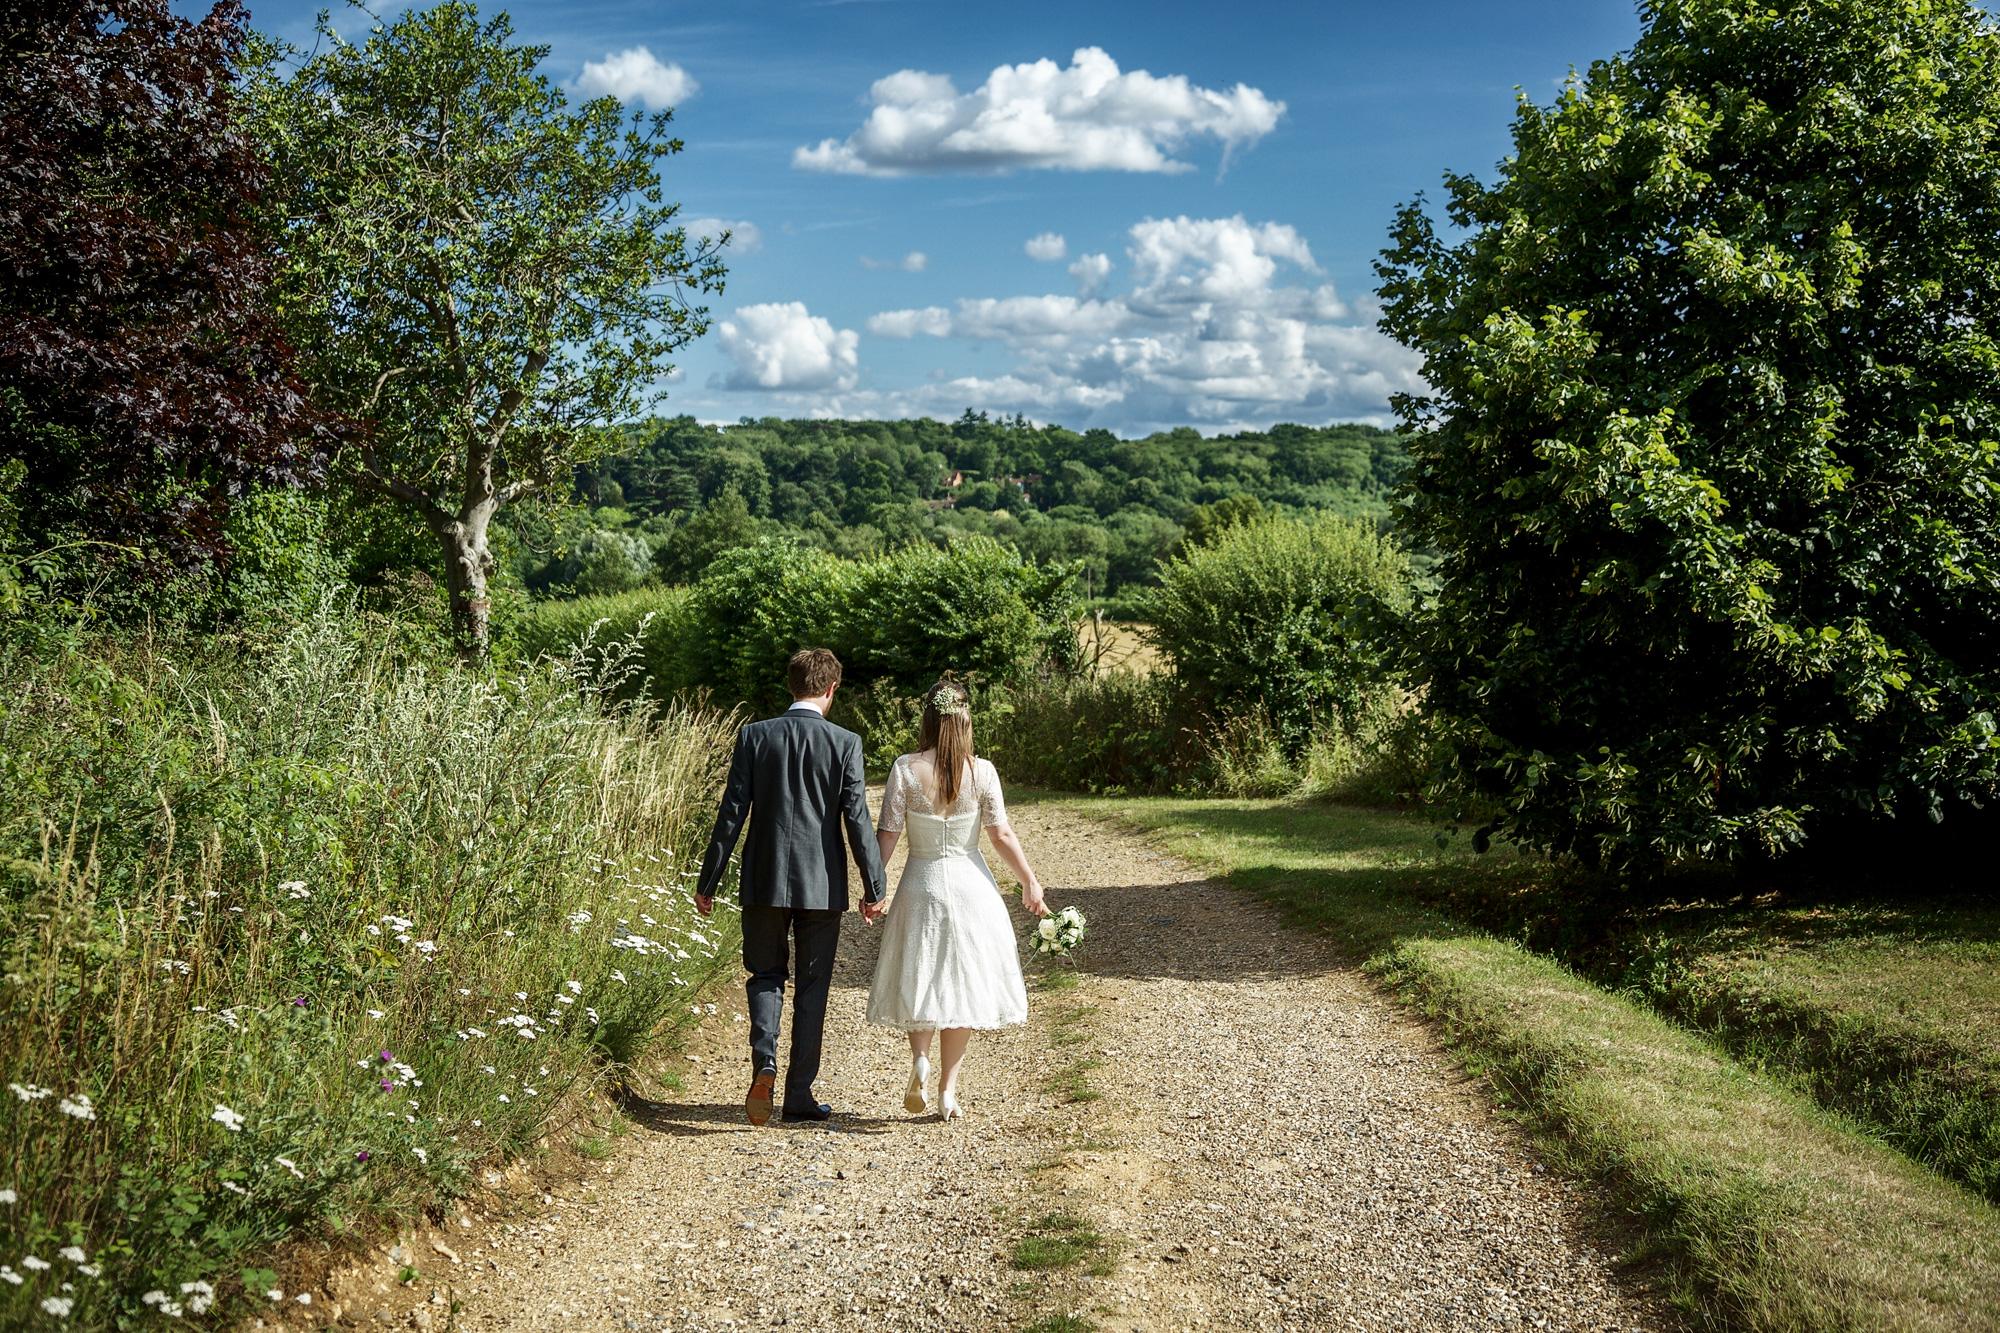 Adam_Hillier_Wedding_Photographer_Newbury_Berkshire_2 (8).jpg